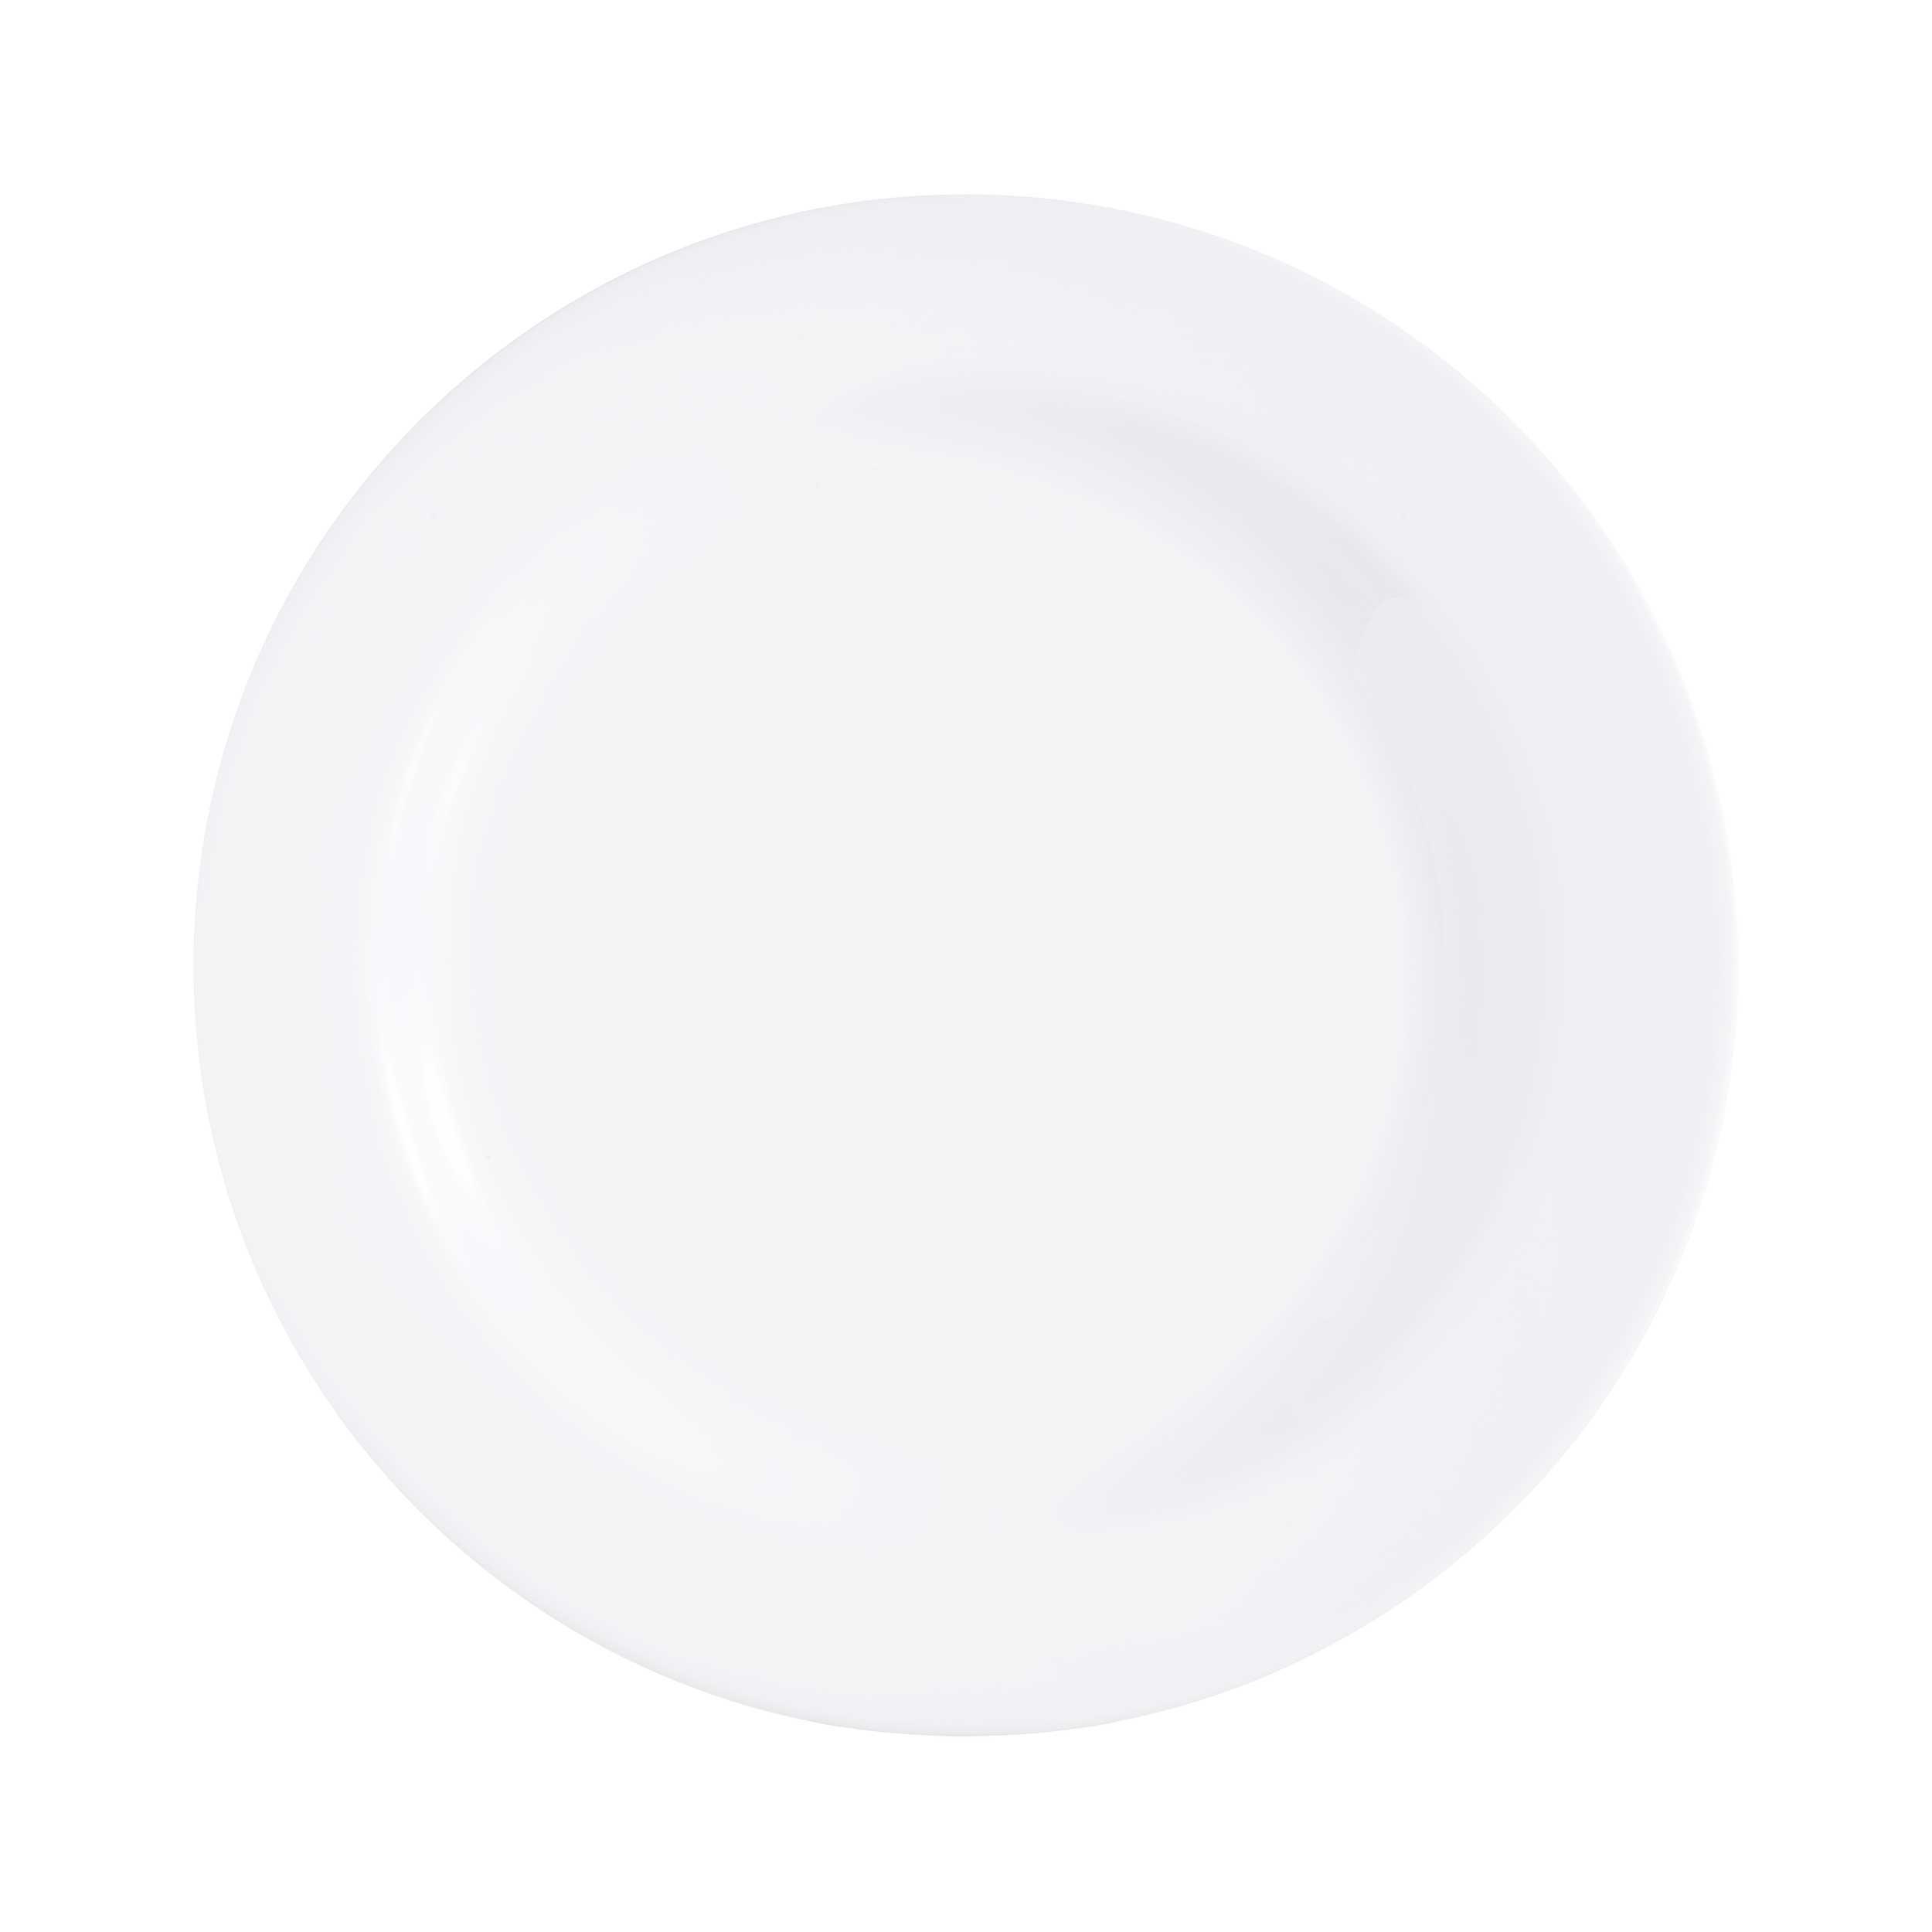 Cardinal E6981 plate, glass